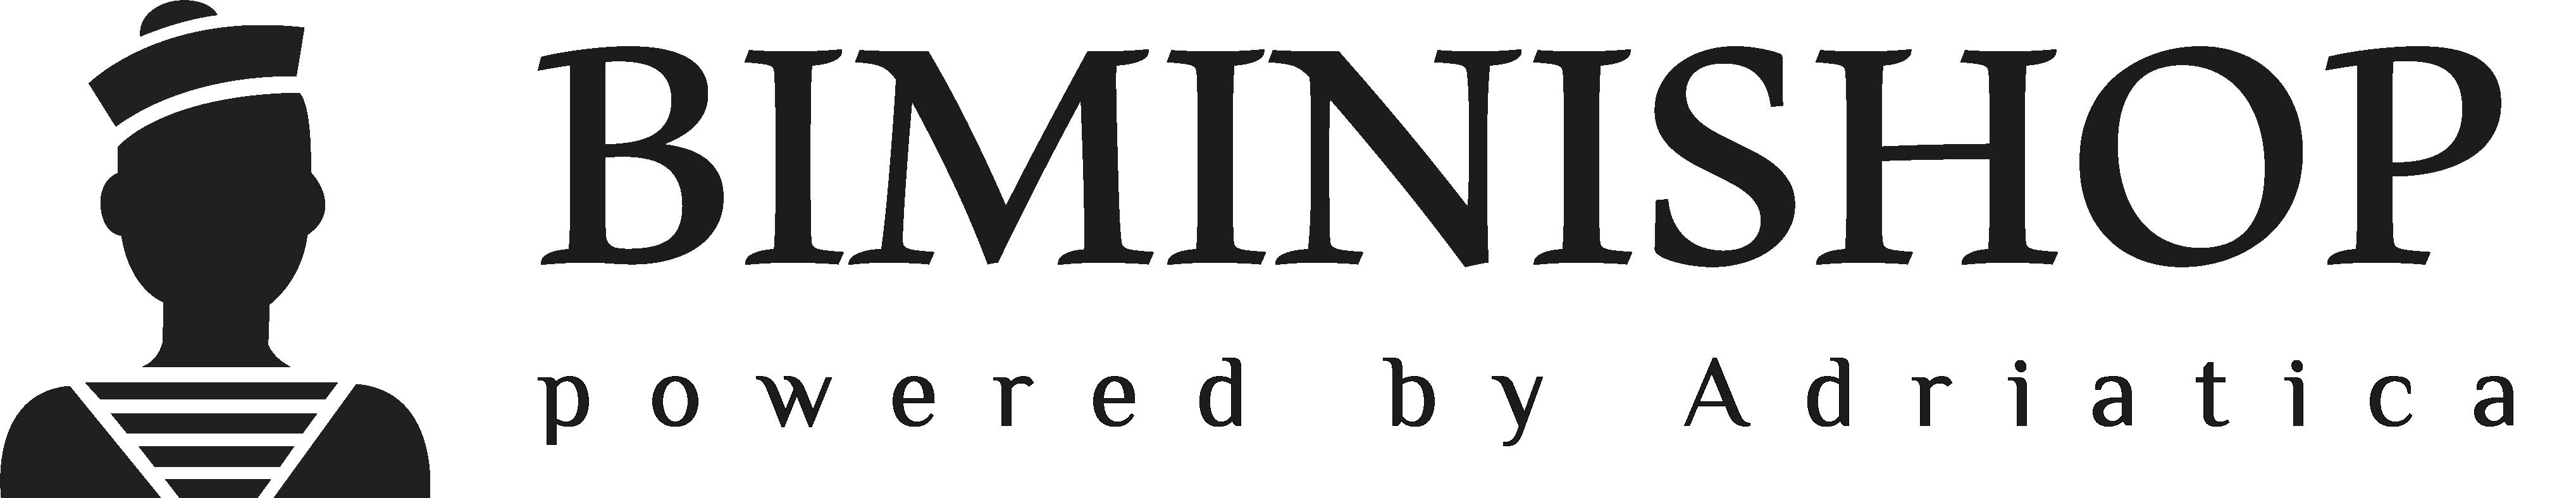 Biminishop – sklep żeglarski